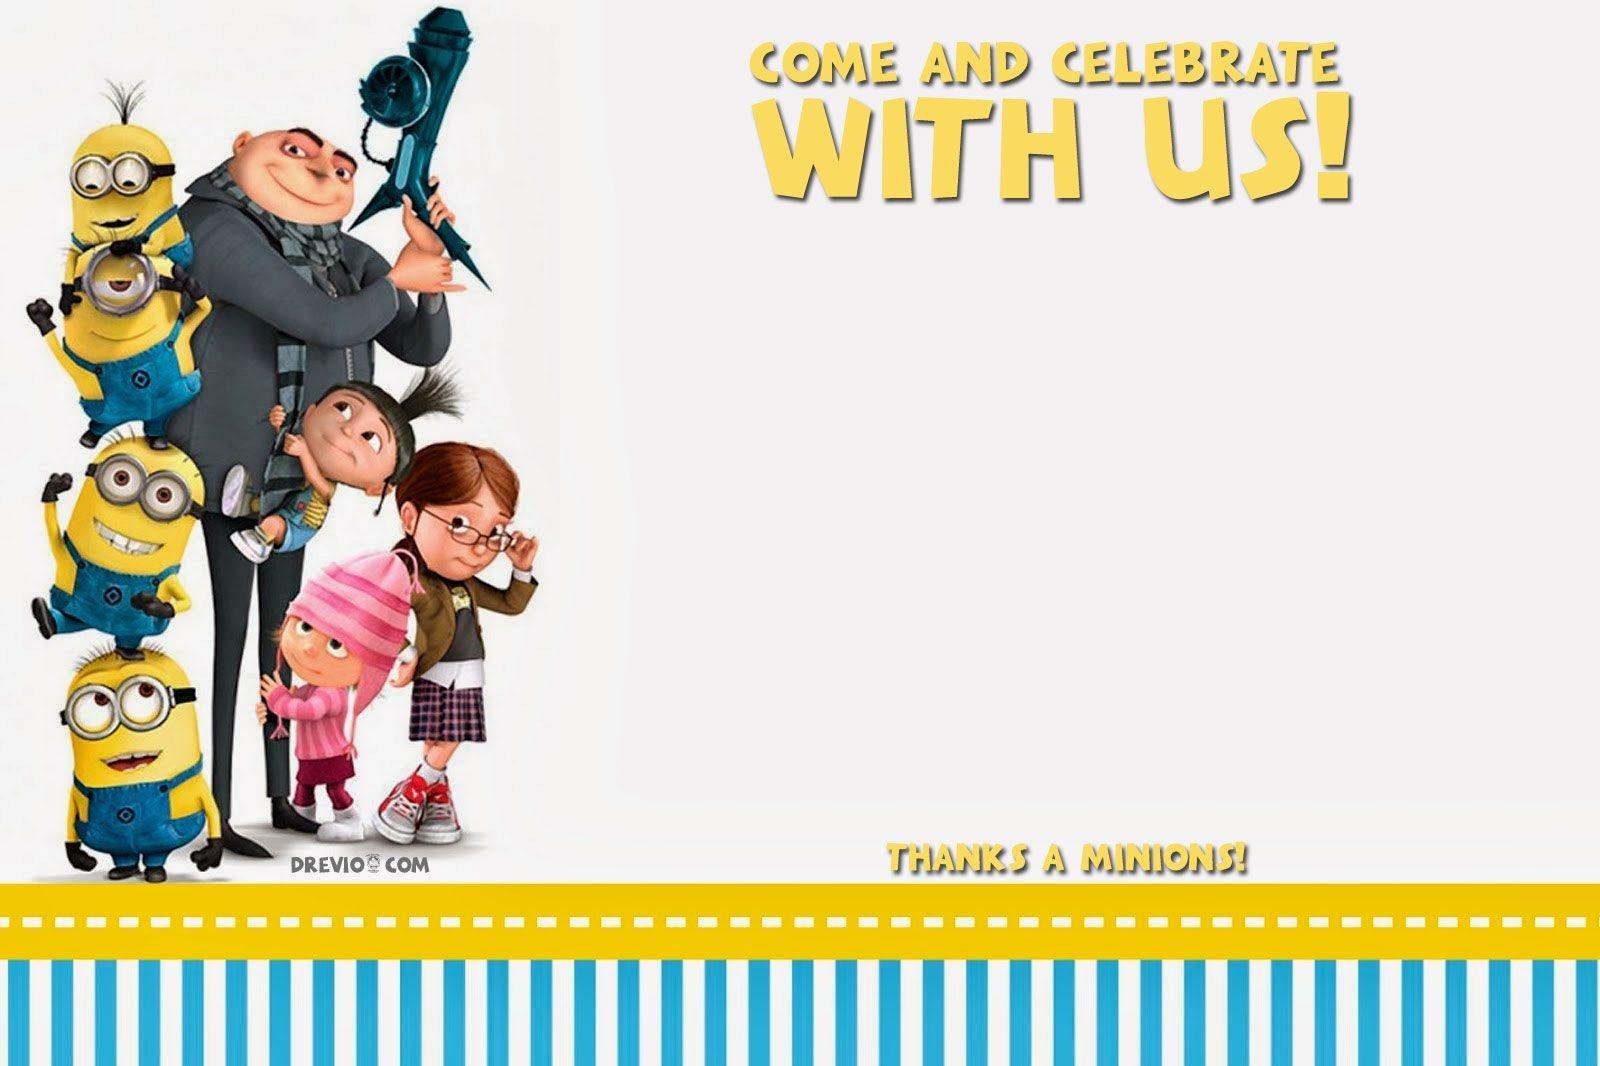 Free Printable Despicable Me Birthday Invitation | Free Printable - Thanks A Minion Free Printable